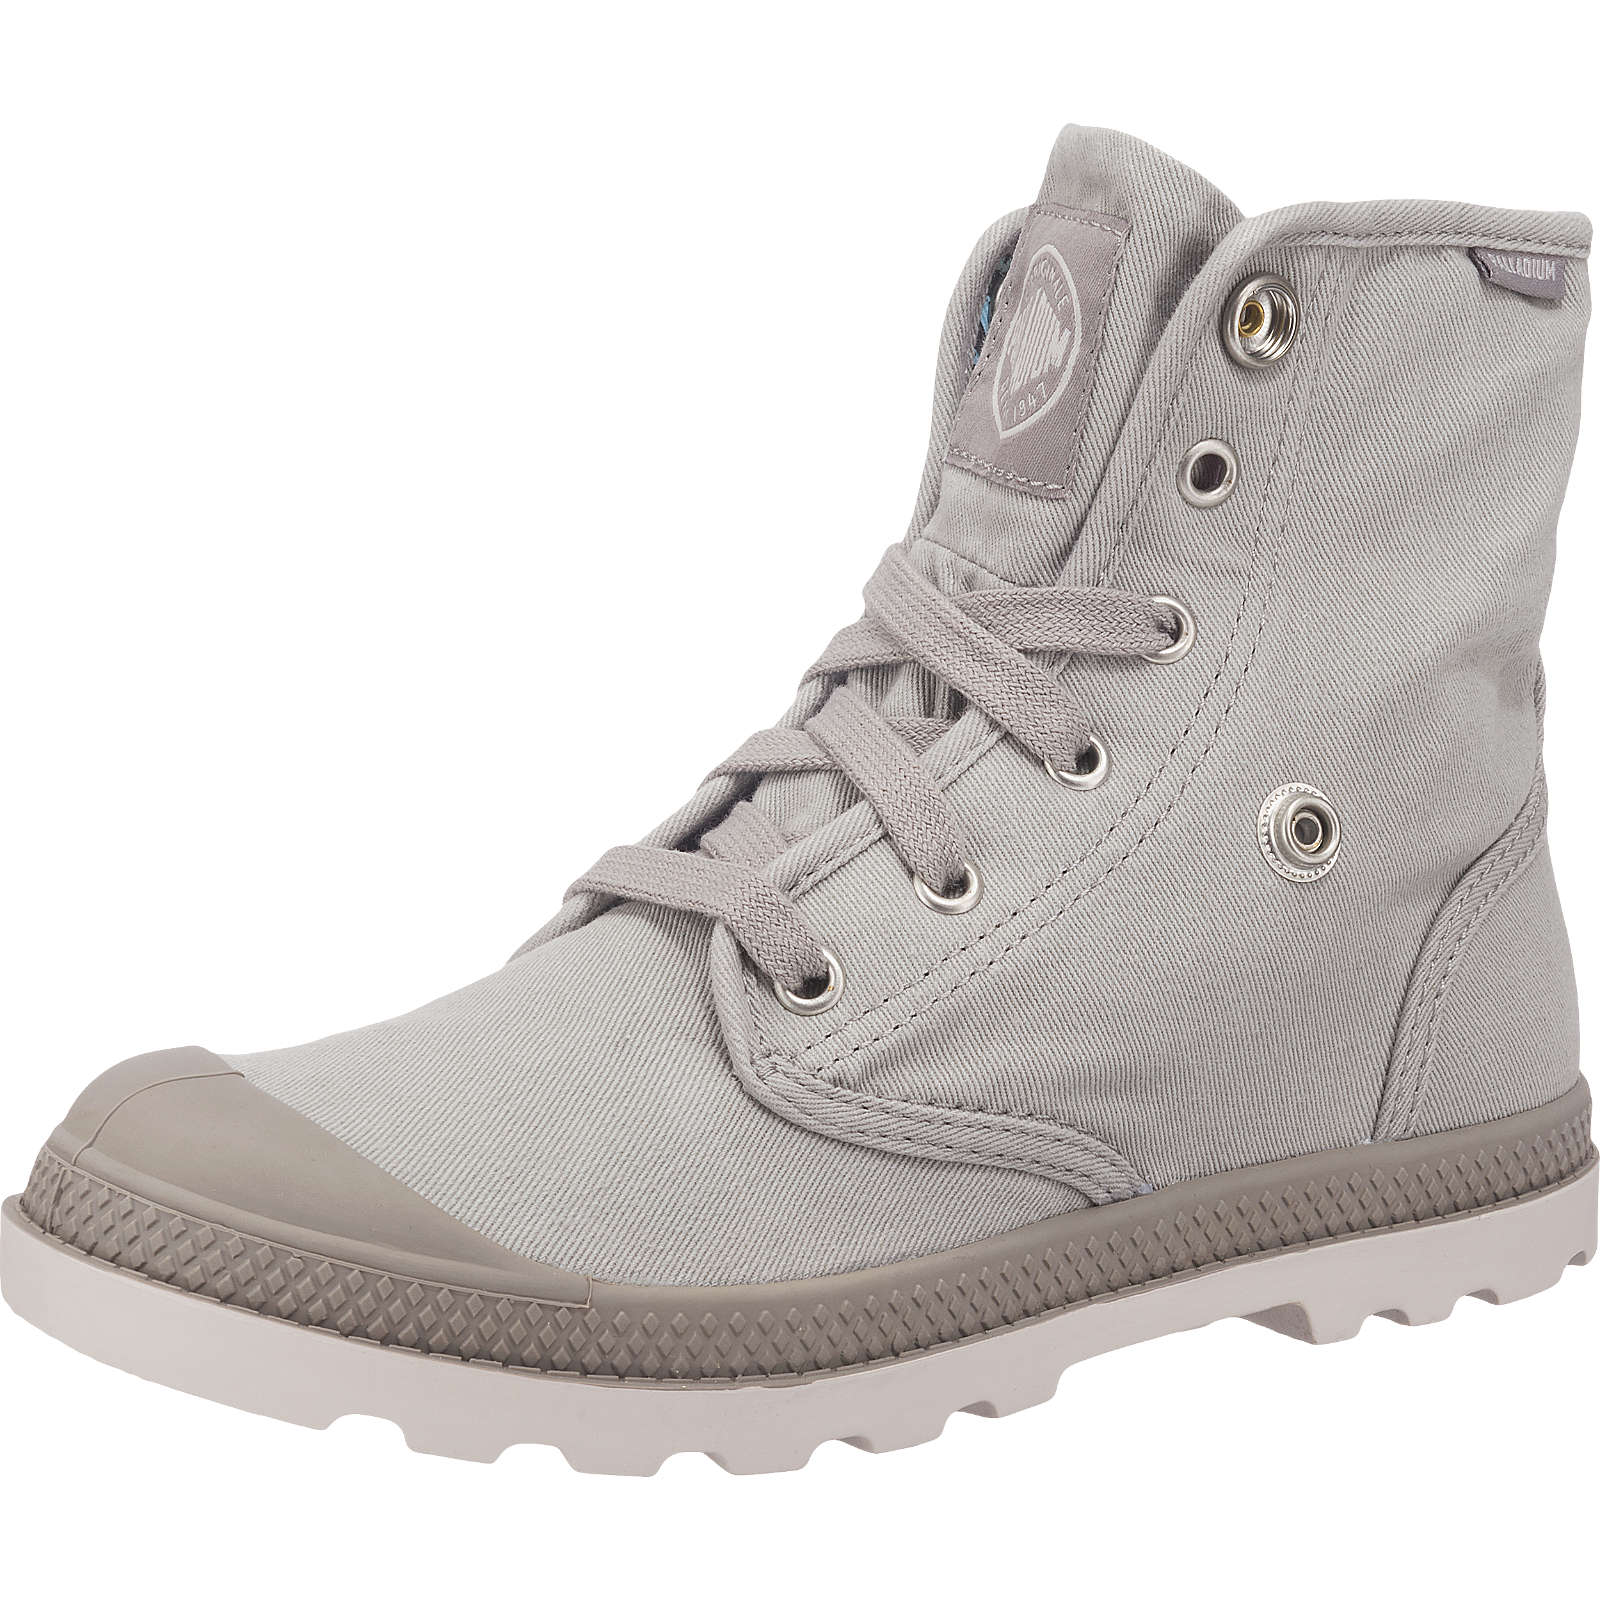 Palladium Baggy Low Lp Tw P Sneakers grau Damen Gr. 40